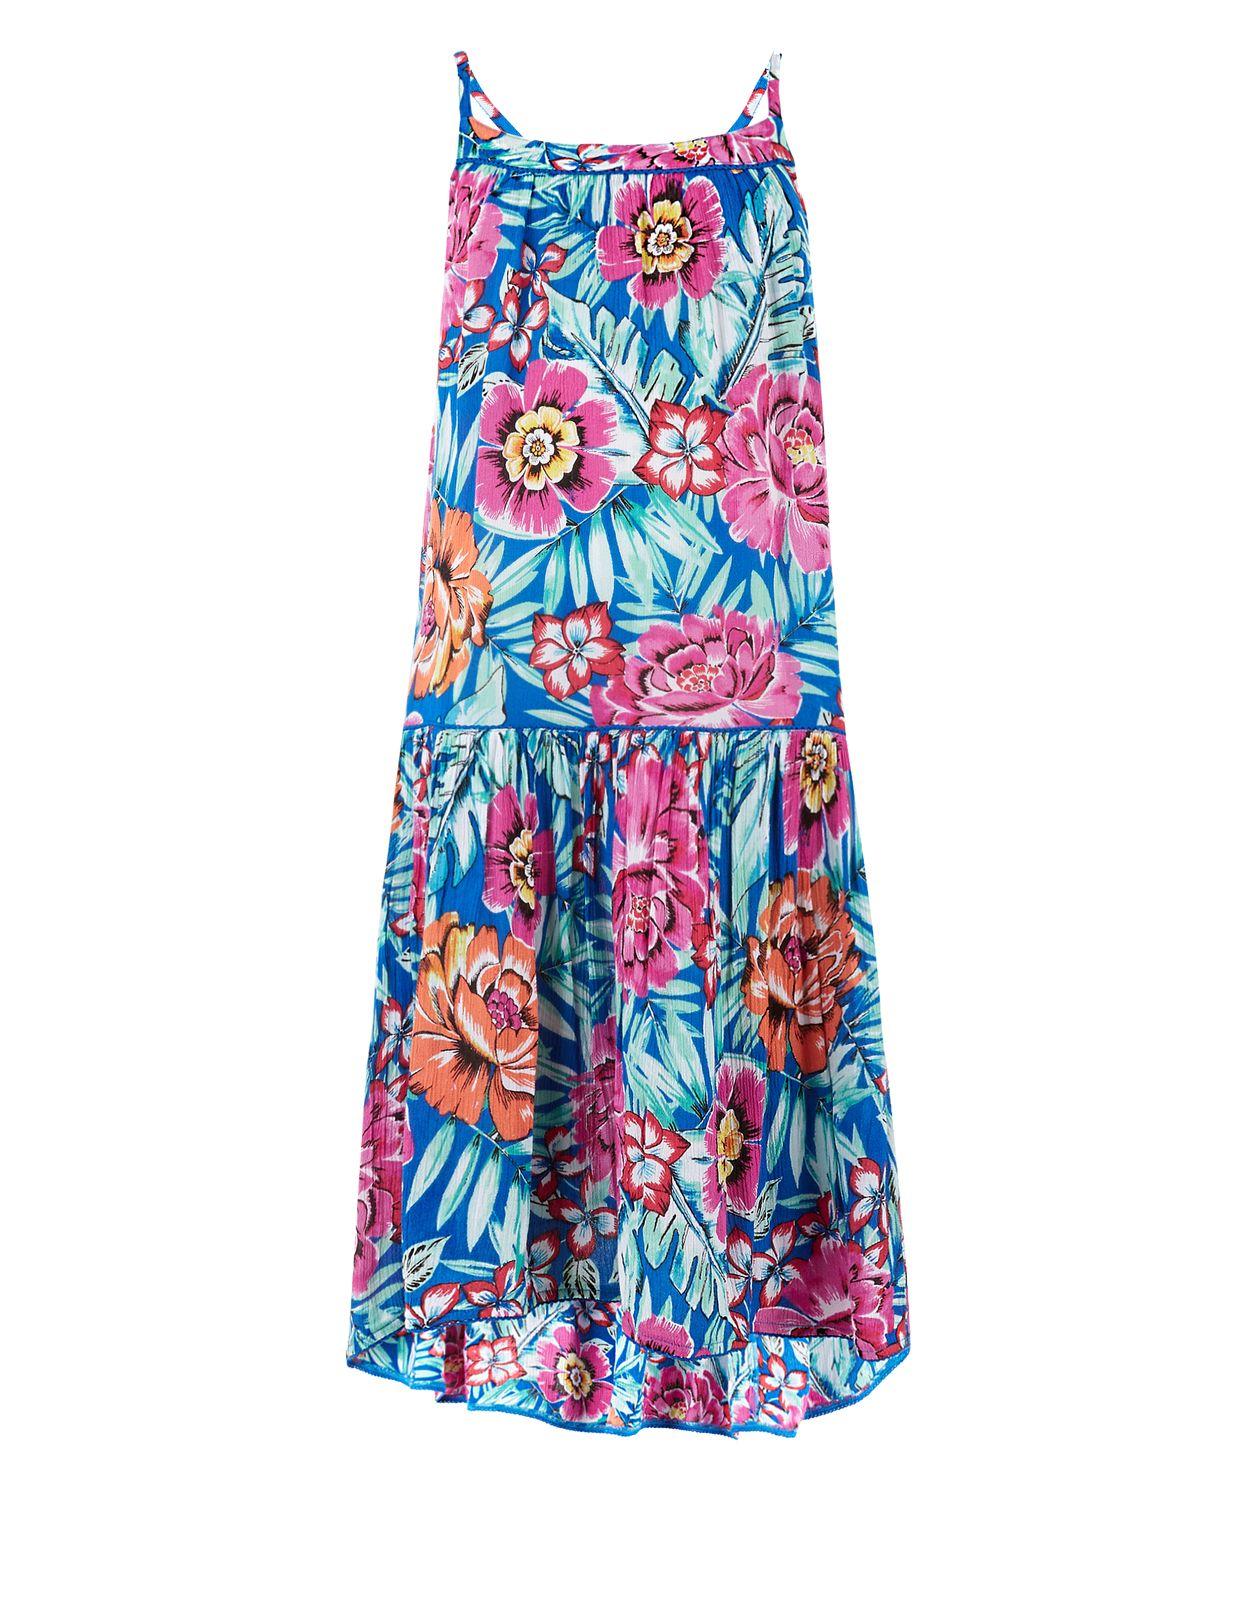 Monsoon | Paloma Floral Print Dress | Multi | 7-8 Years | prints ...